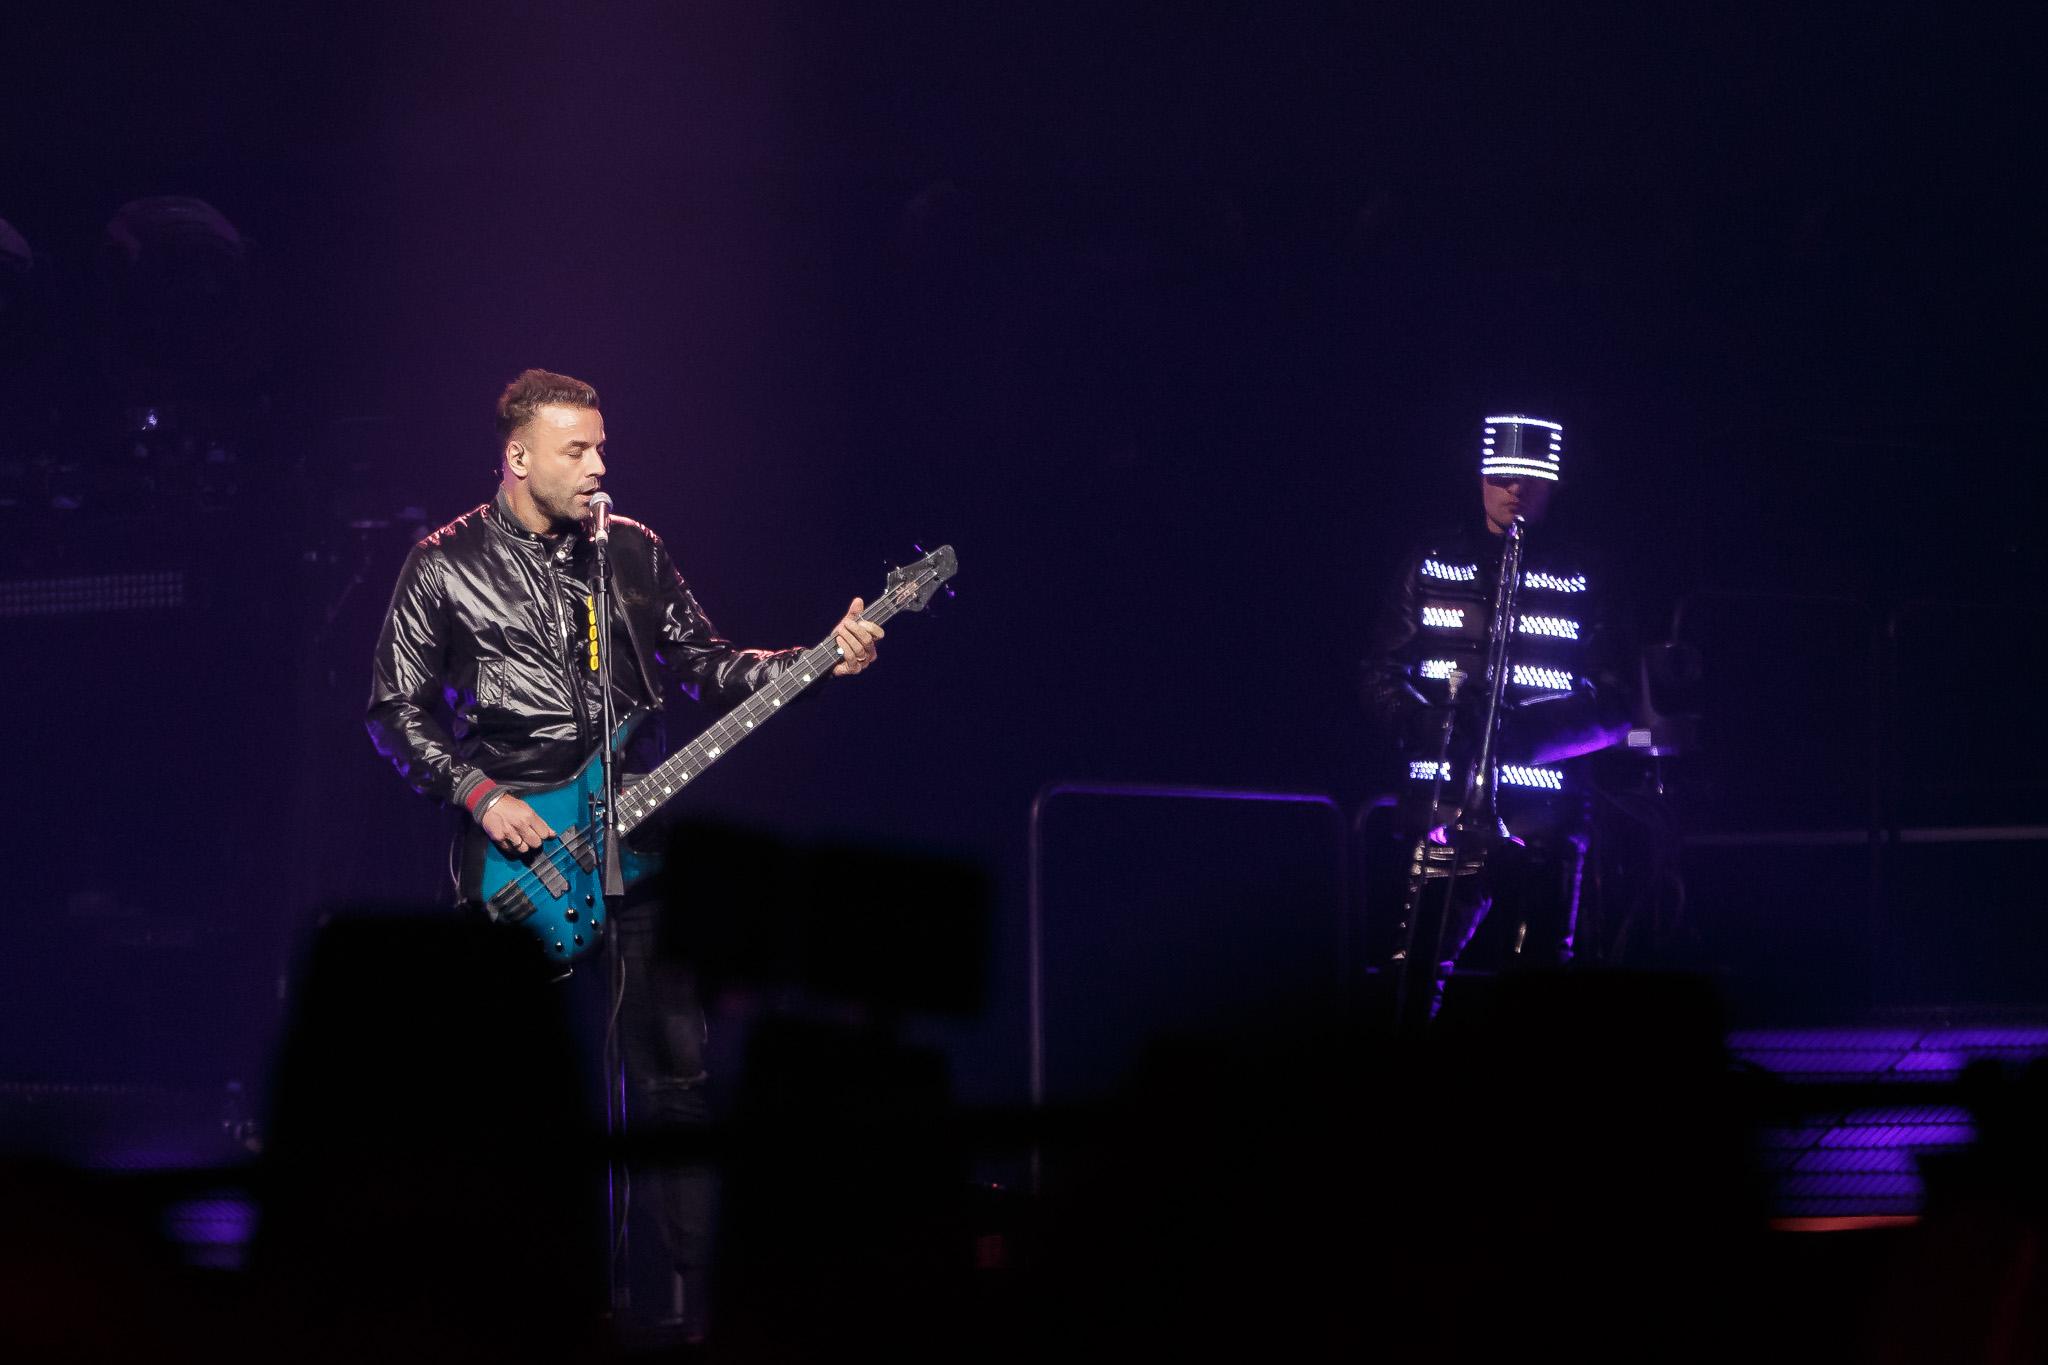 Muse-11.jpg